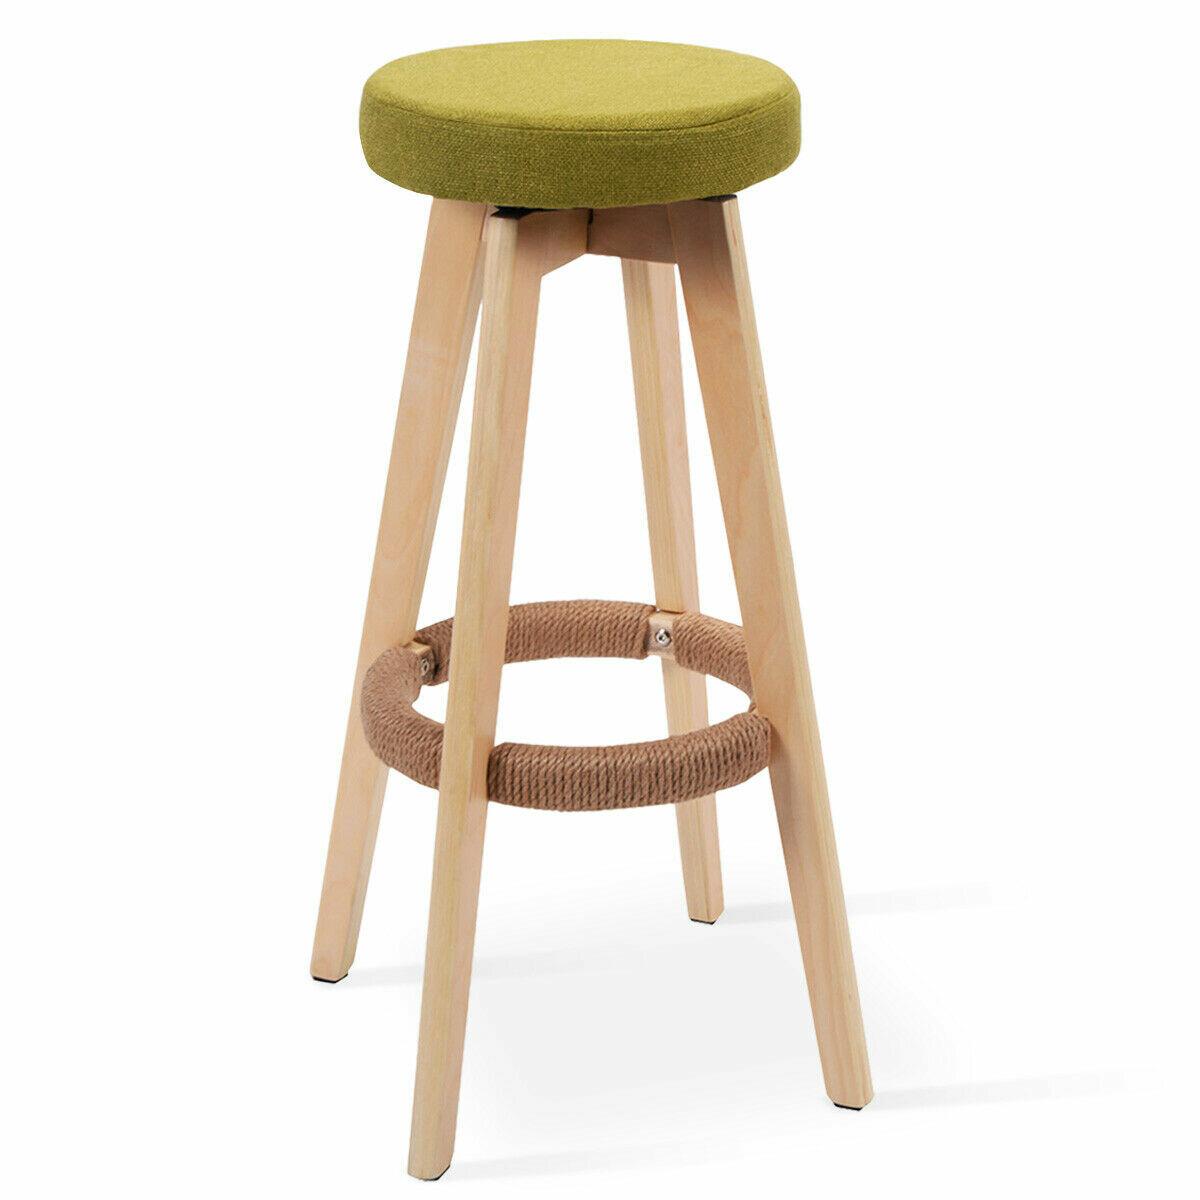 Cool Torino 29 Swivel Bar Stool Andrewgaddart Wooden Chair Designs For Living Room Andrewgaddartcom